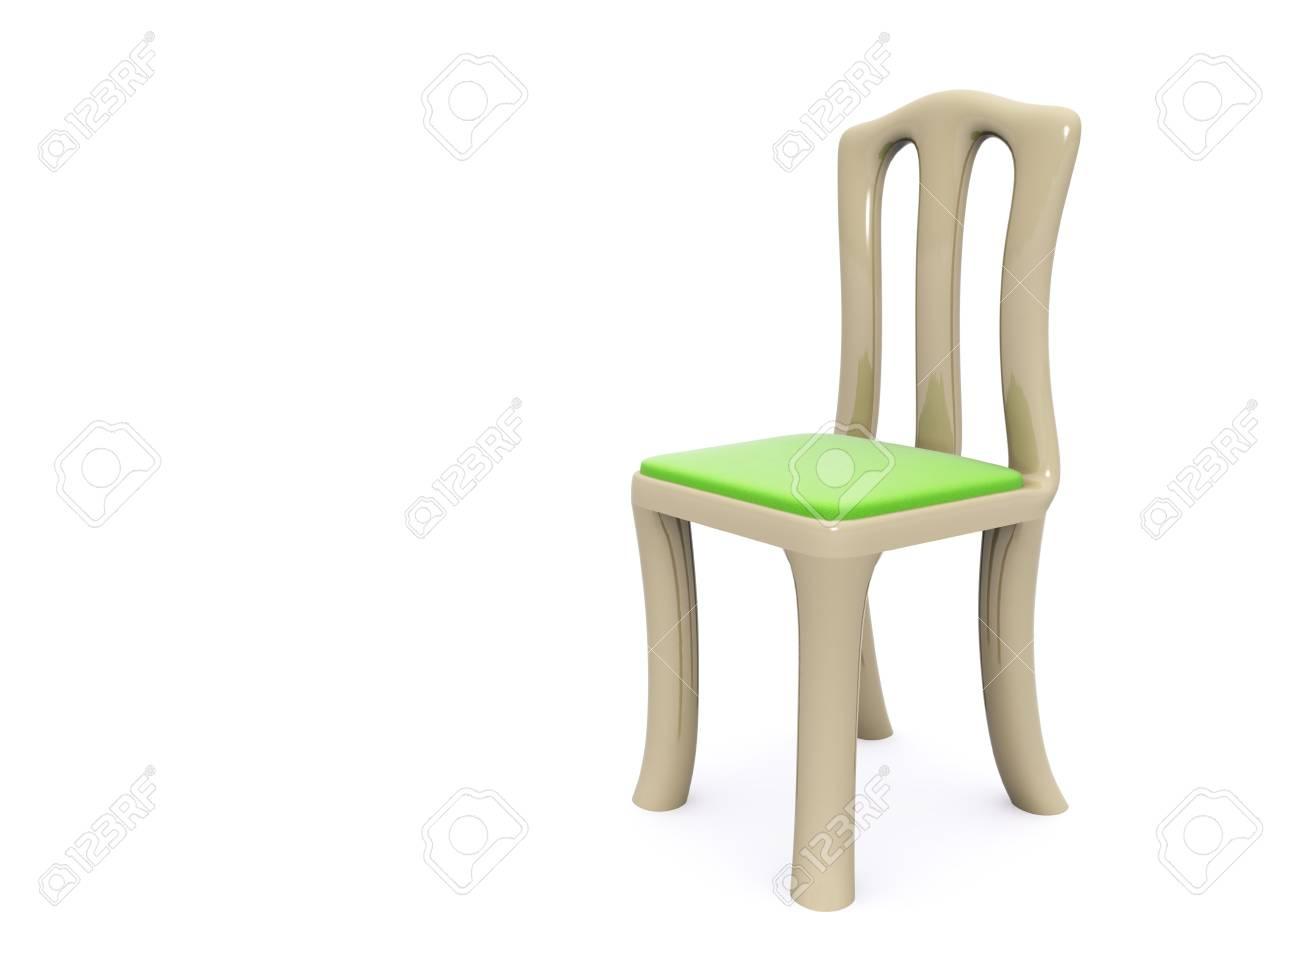 single chair. 3d Stock Photo - 6469979